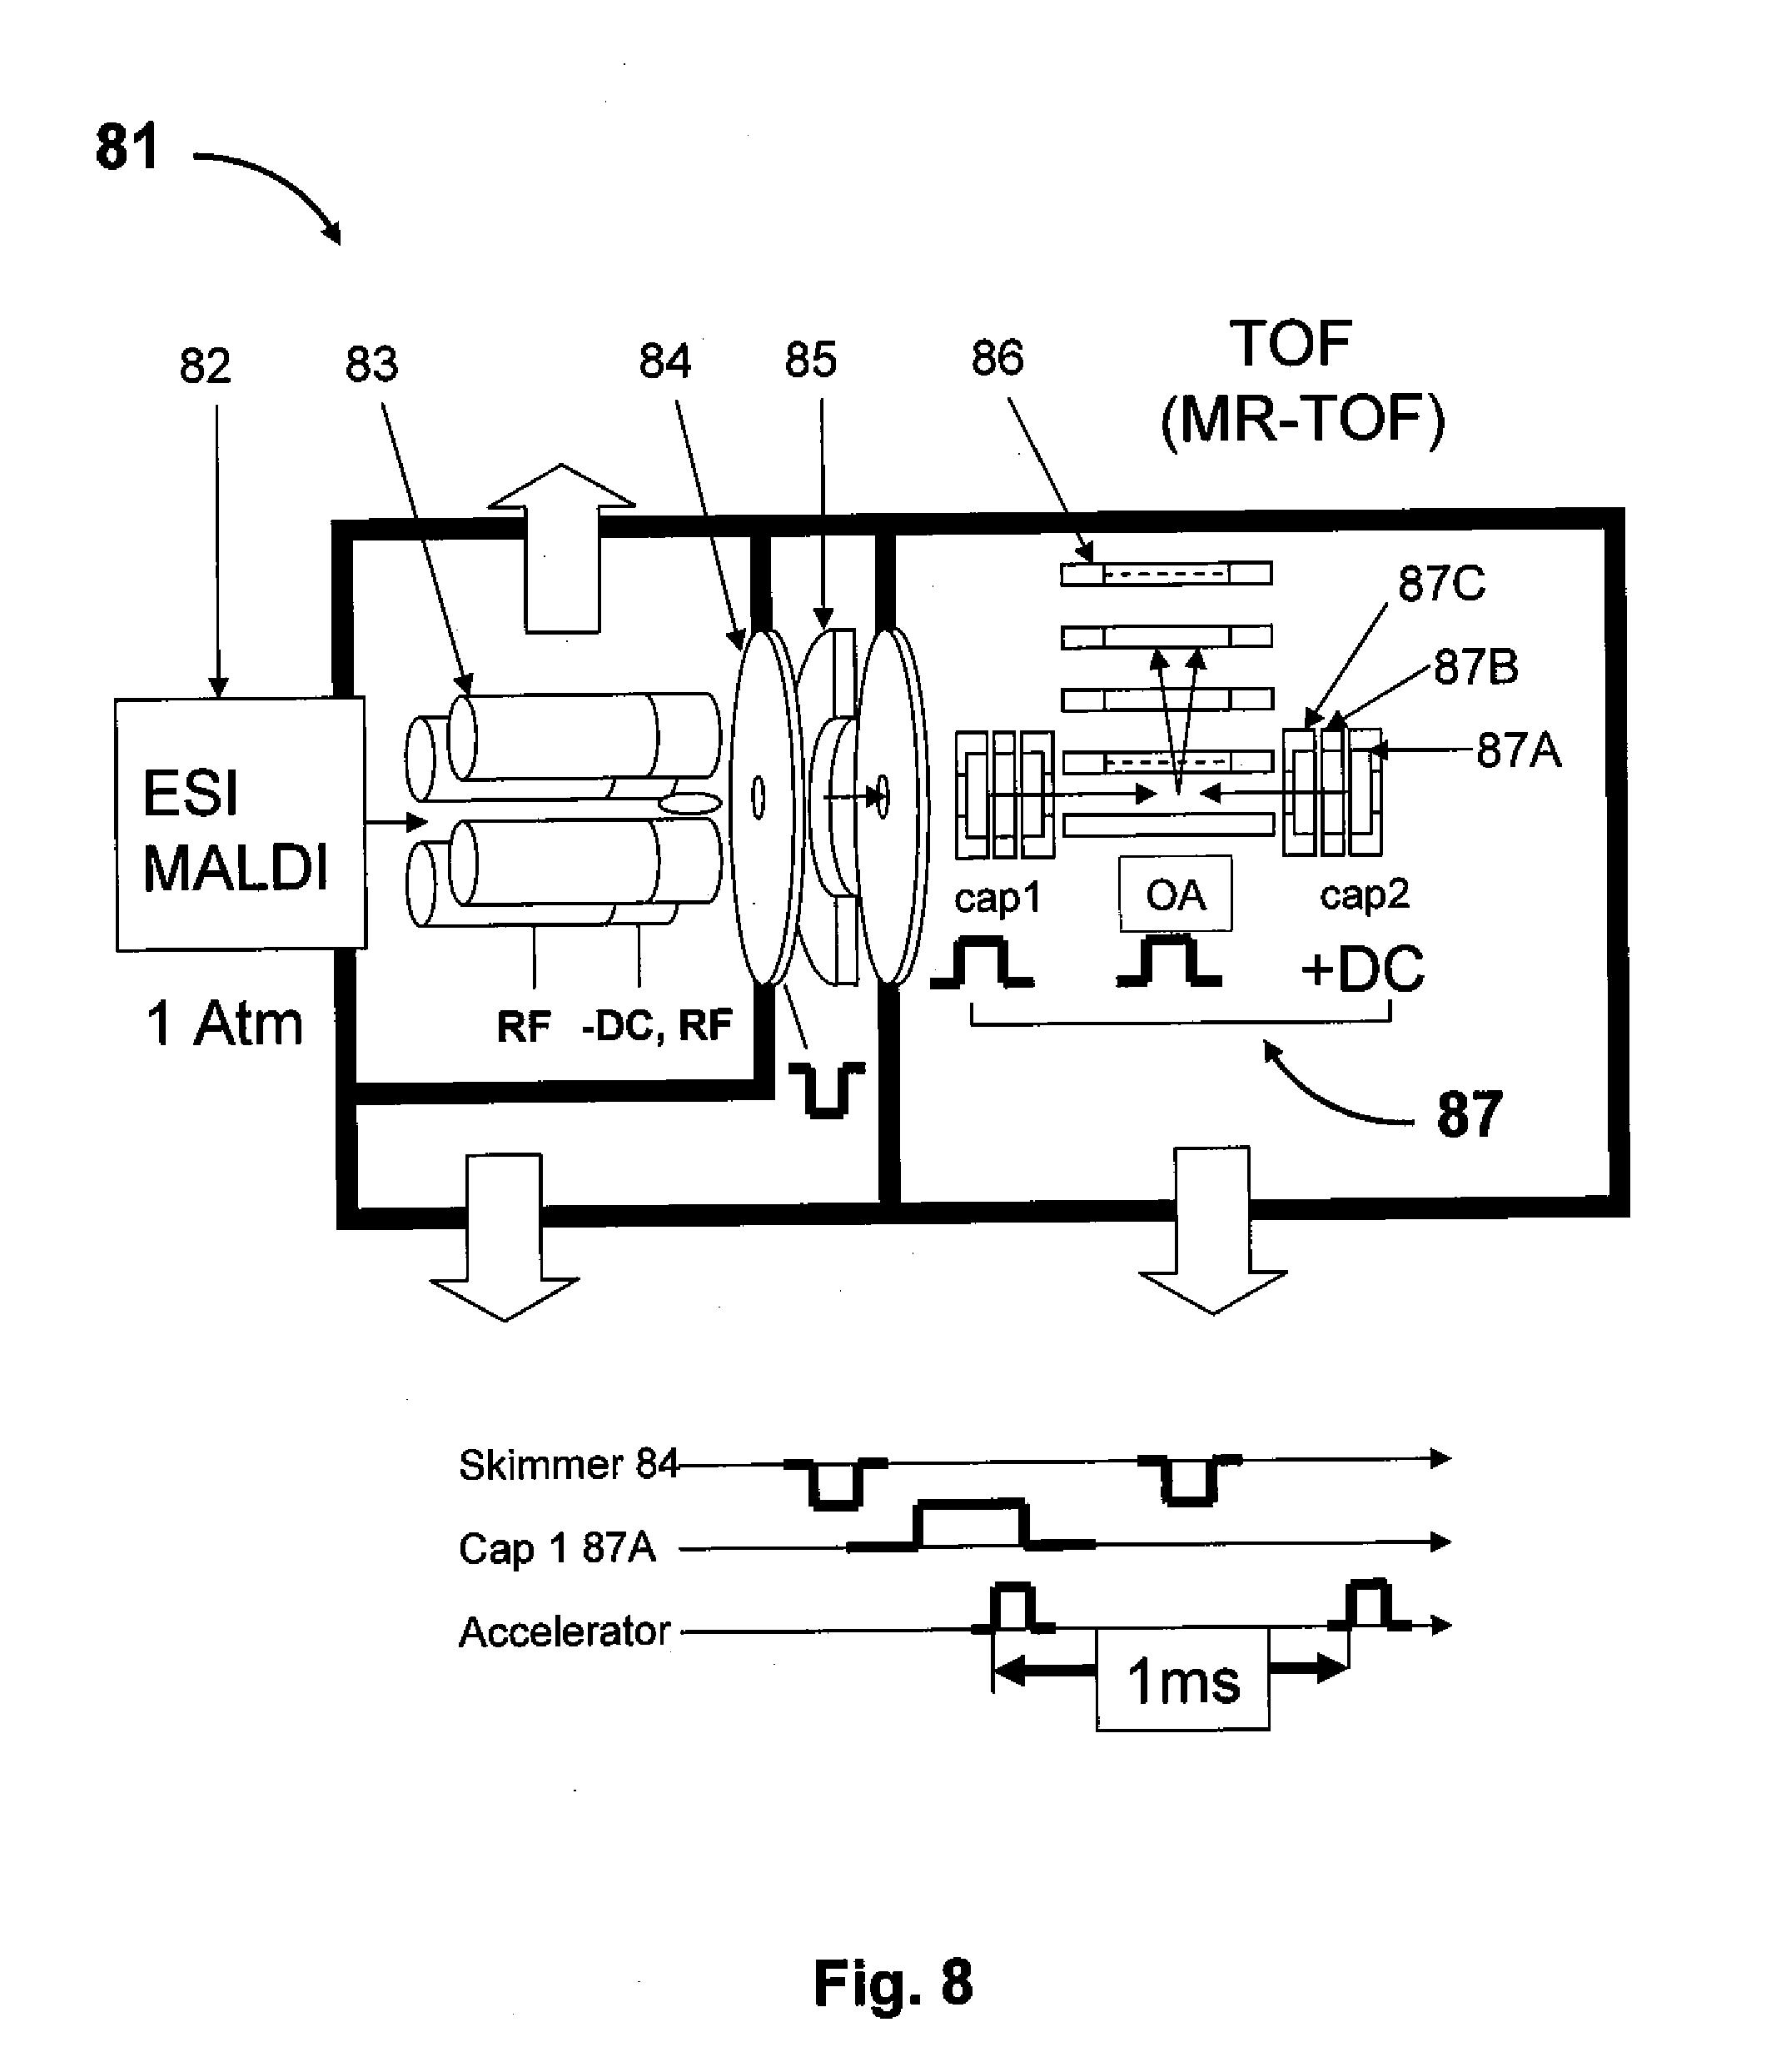 passtime gps wiring diagram 3 phase 480v to 120v transformer pte 2 gallery sample